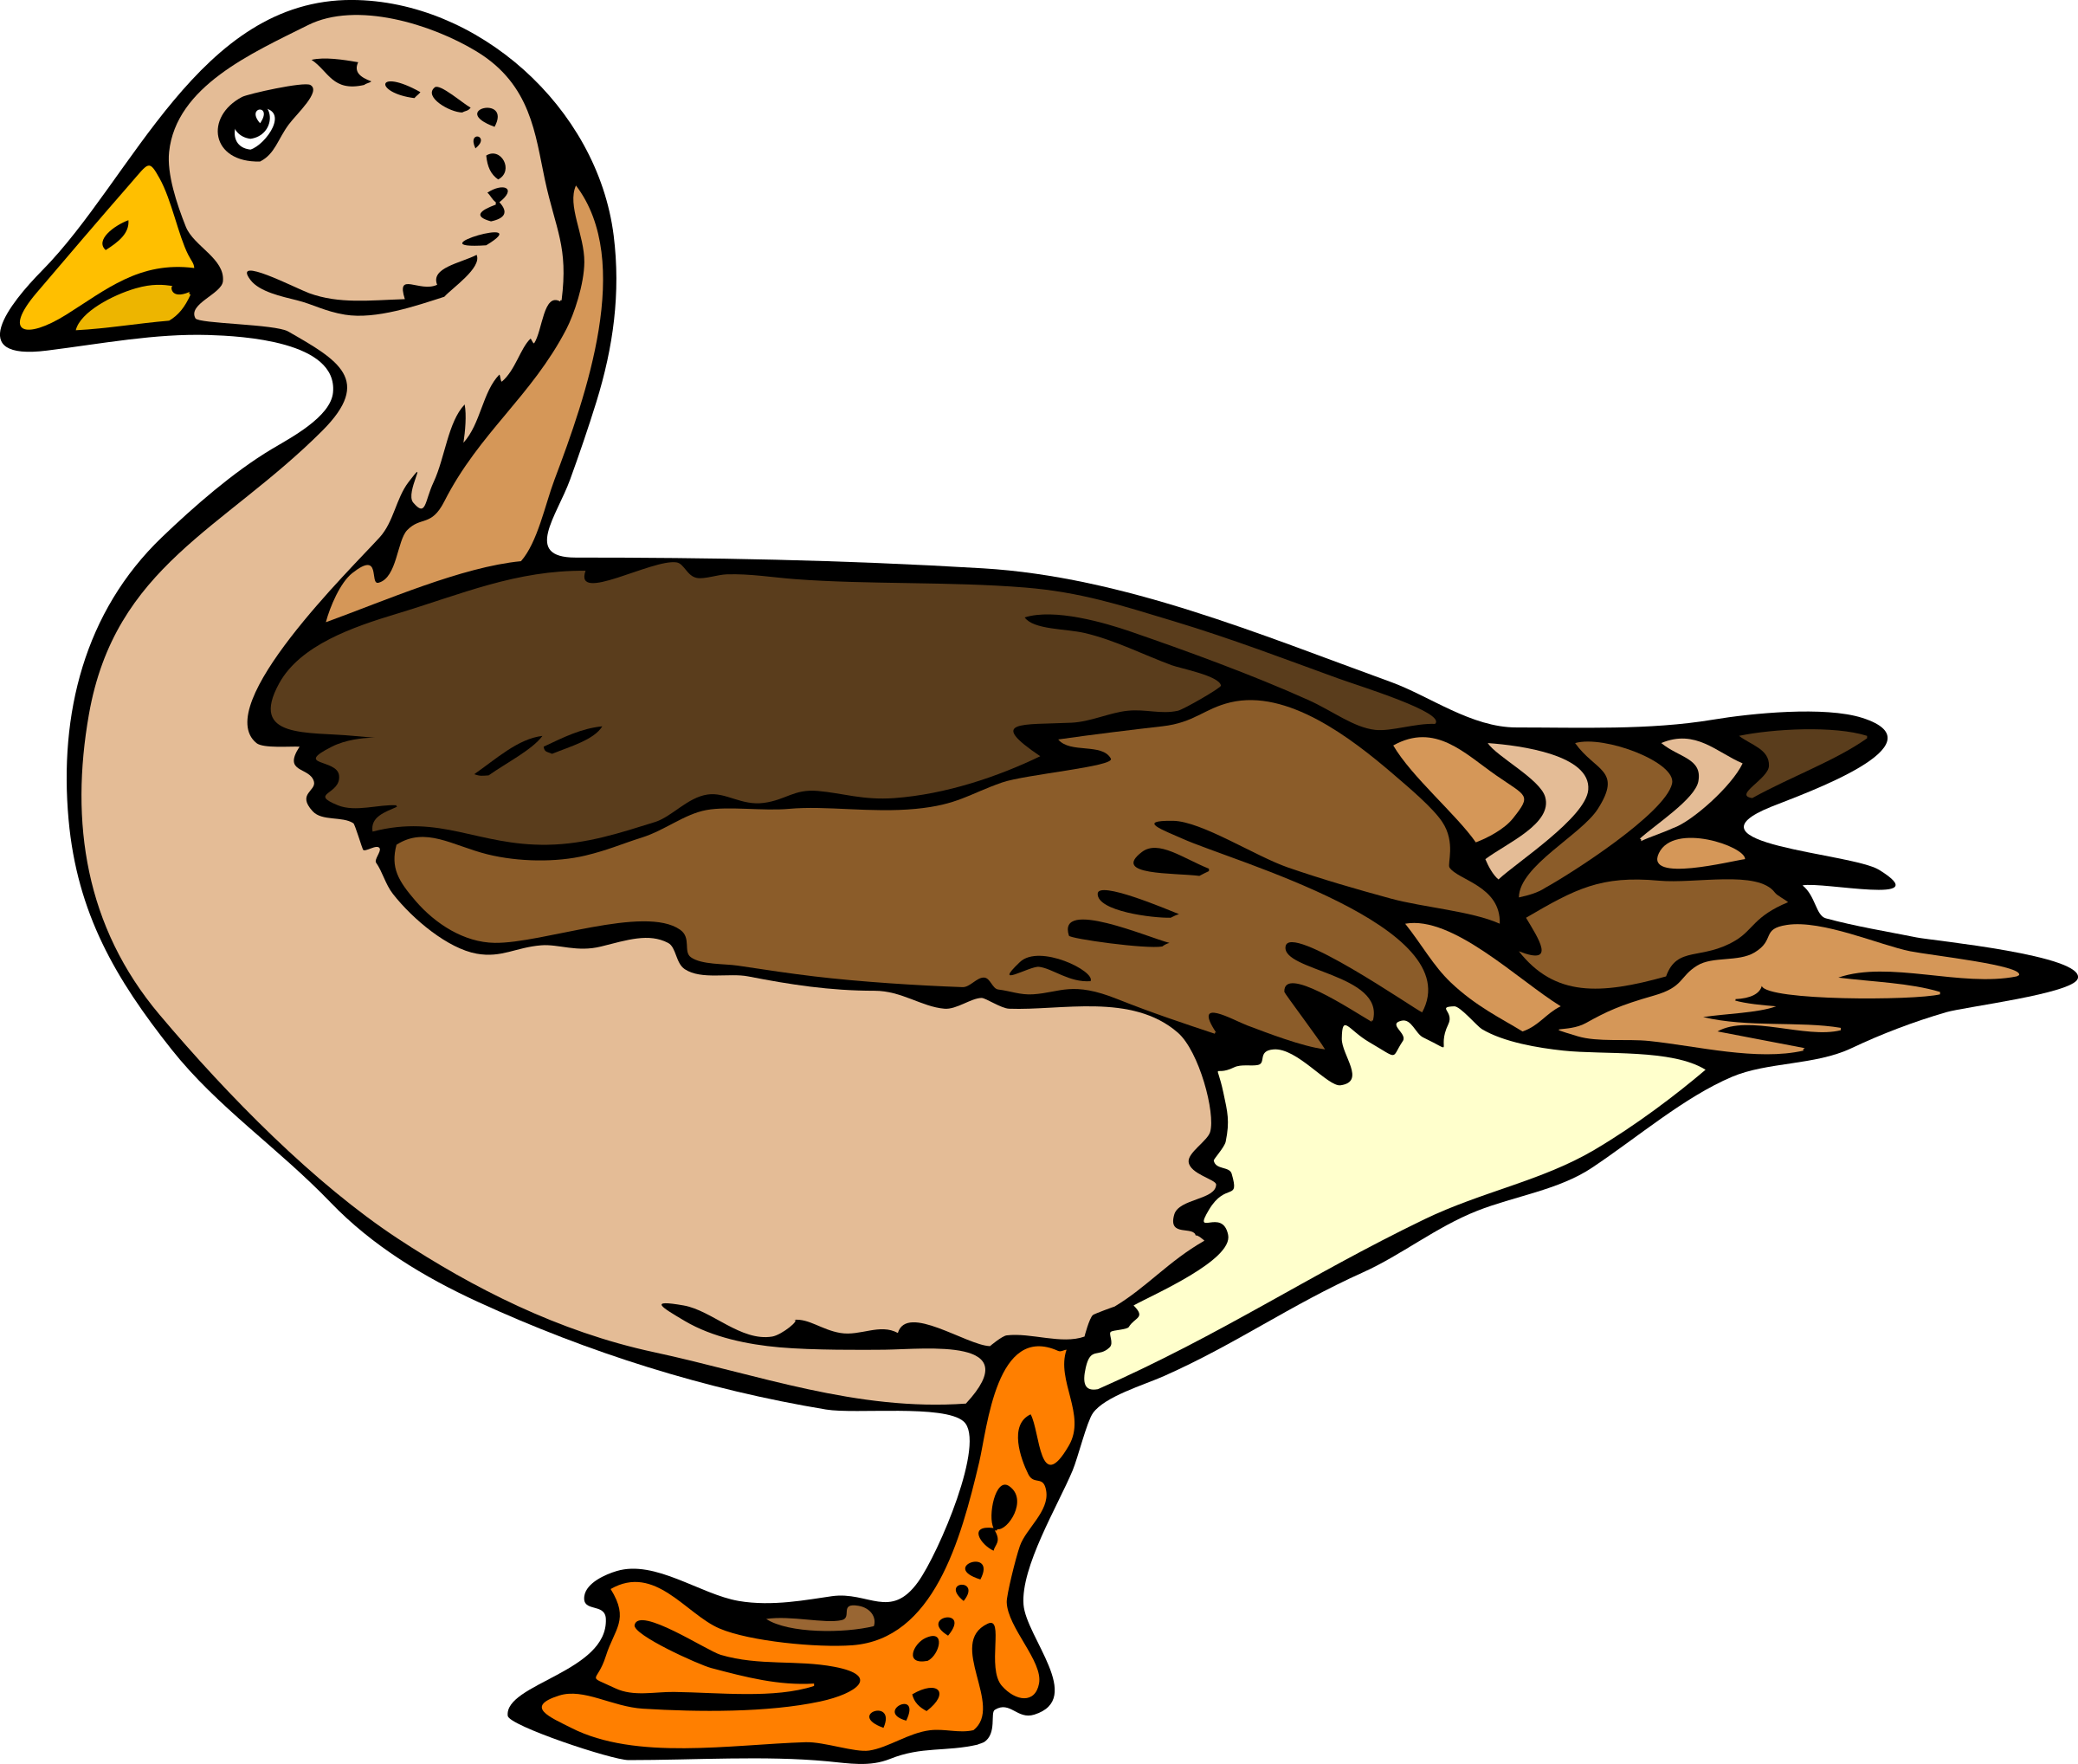 2400x2037 Duck Clip Art Image Free